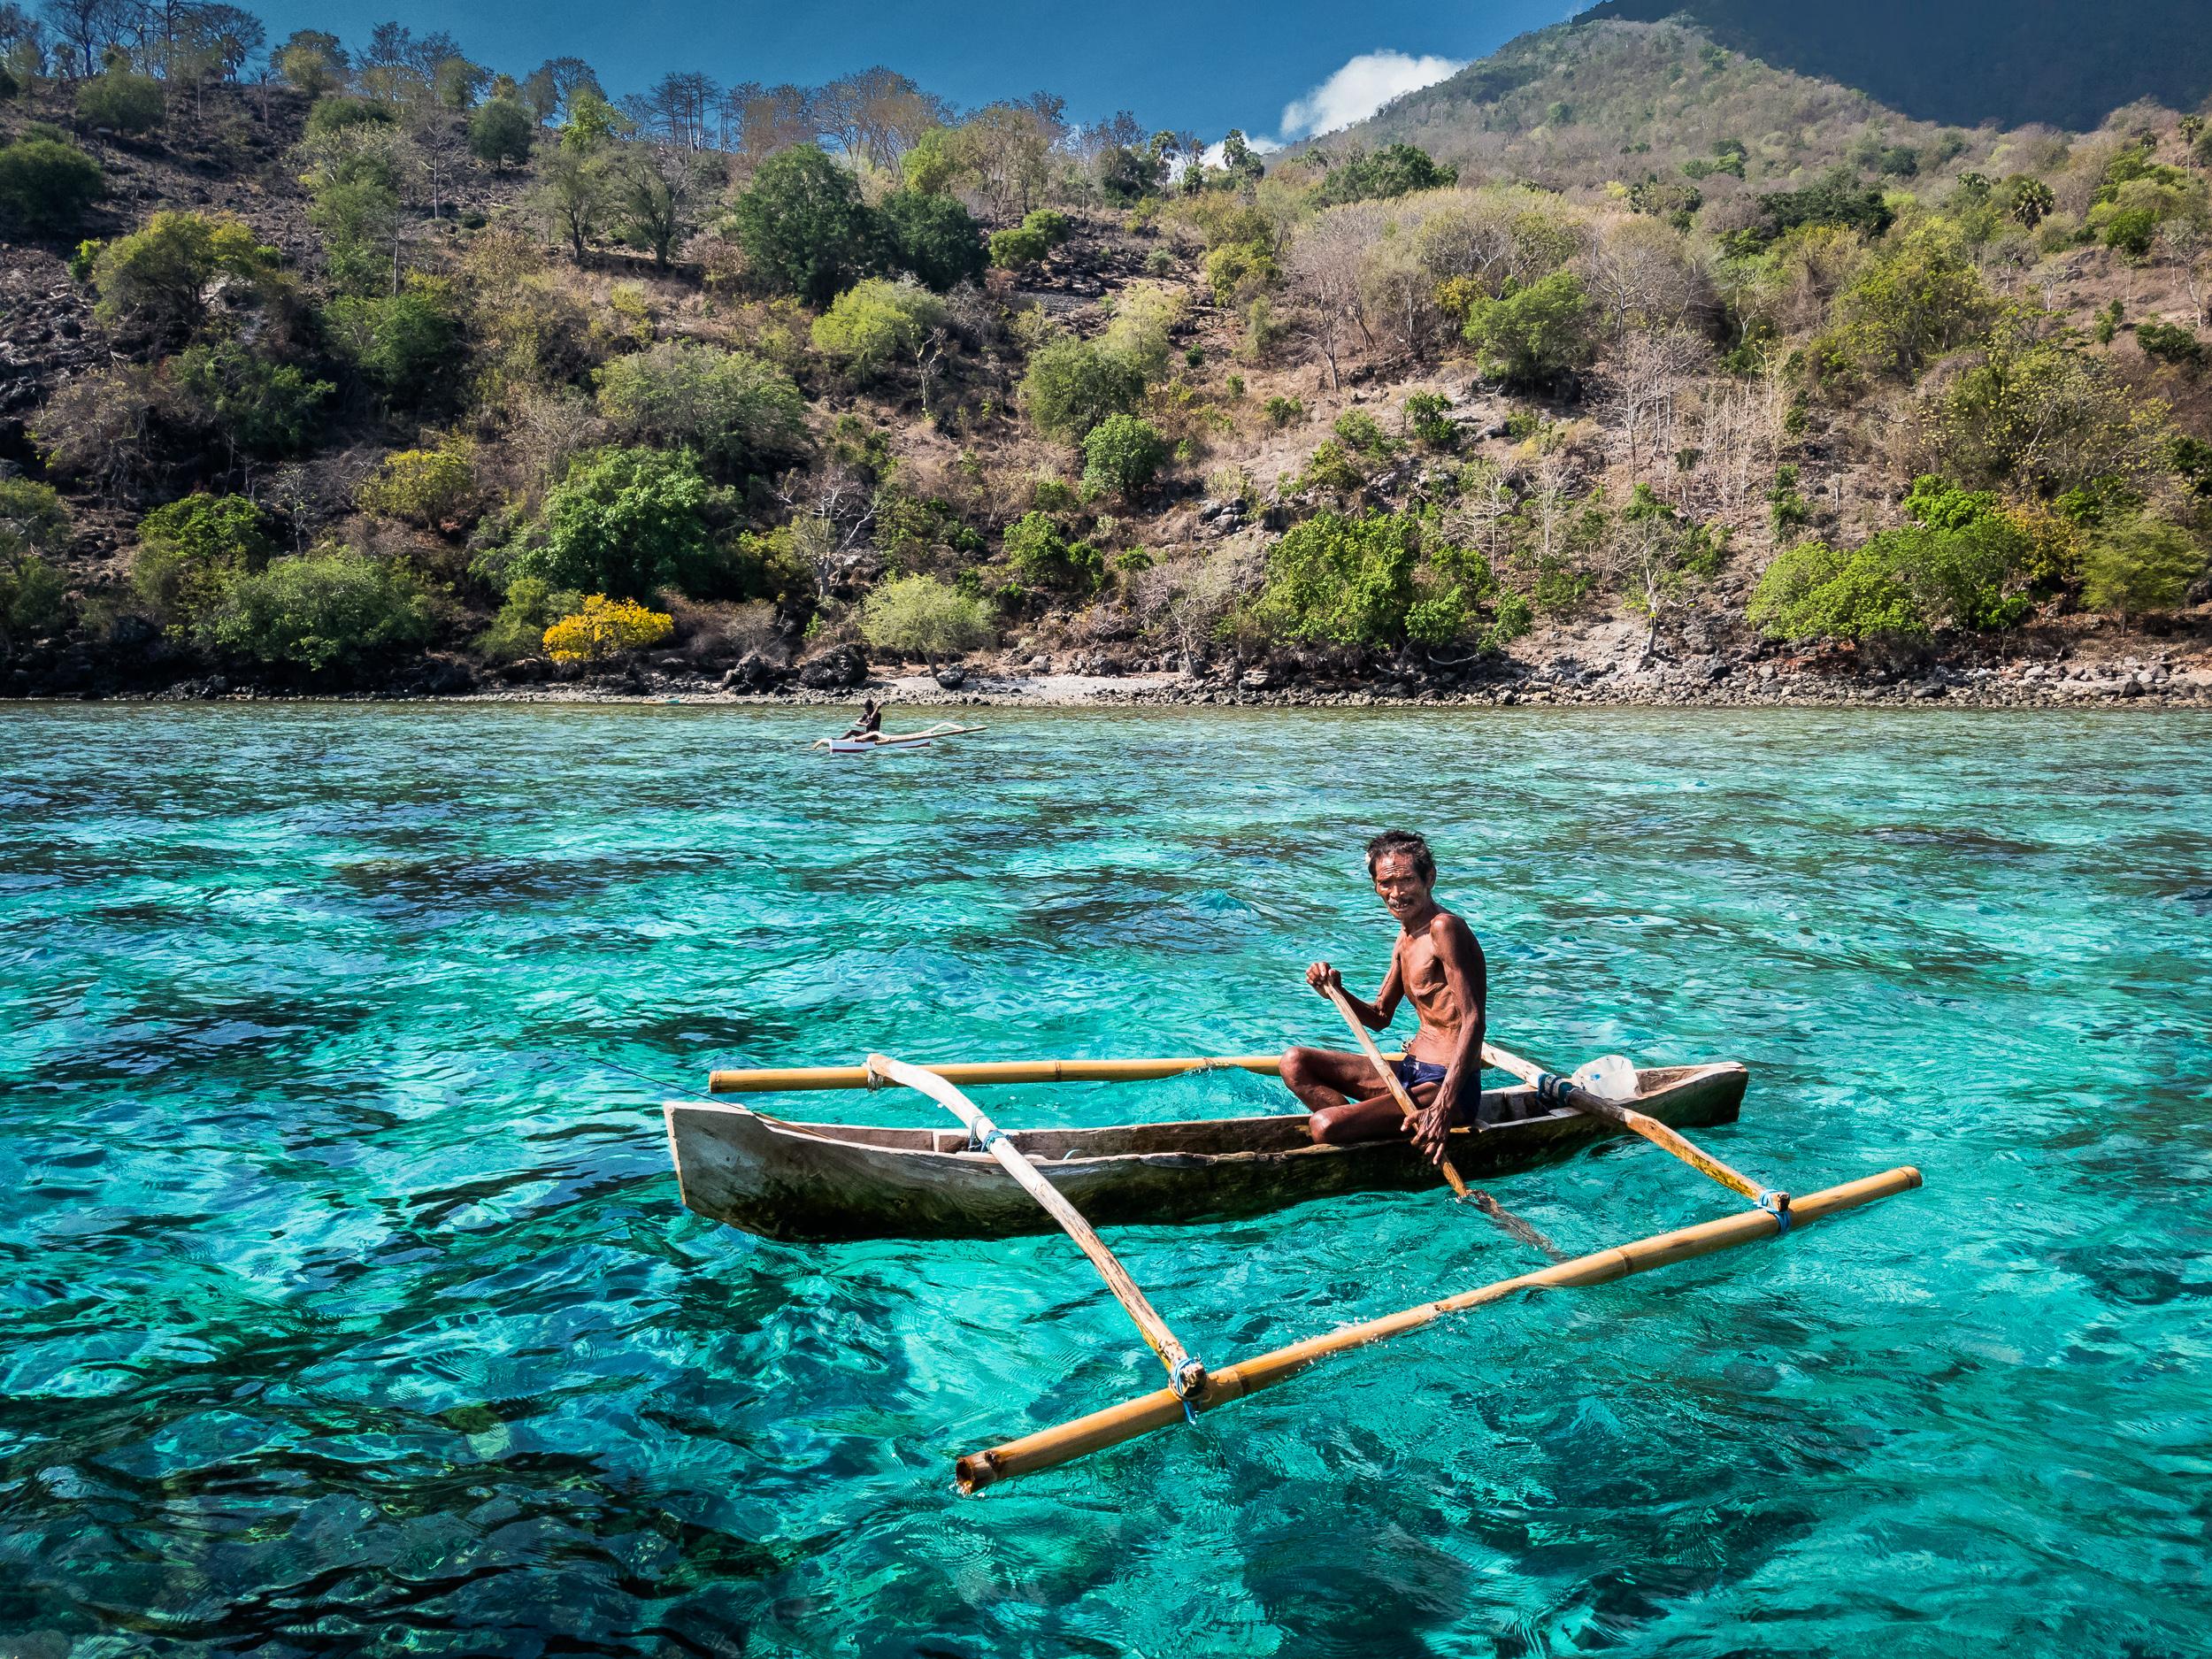 Fisherman, Alor, Indonesia